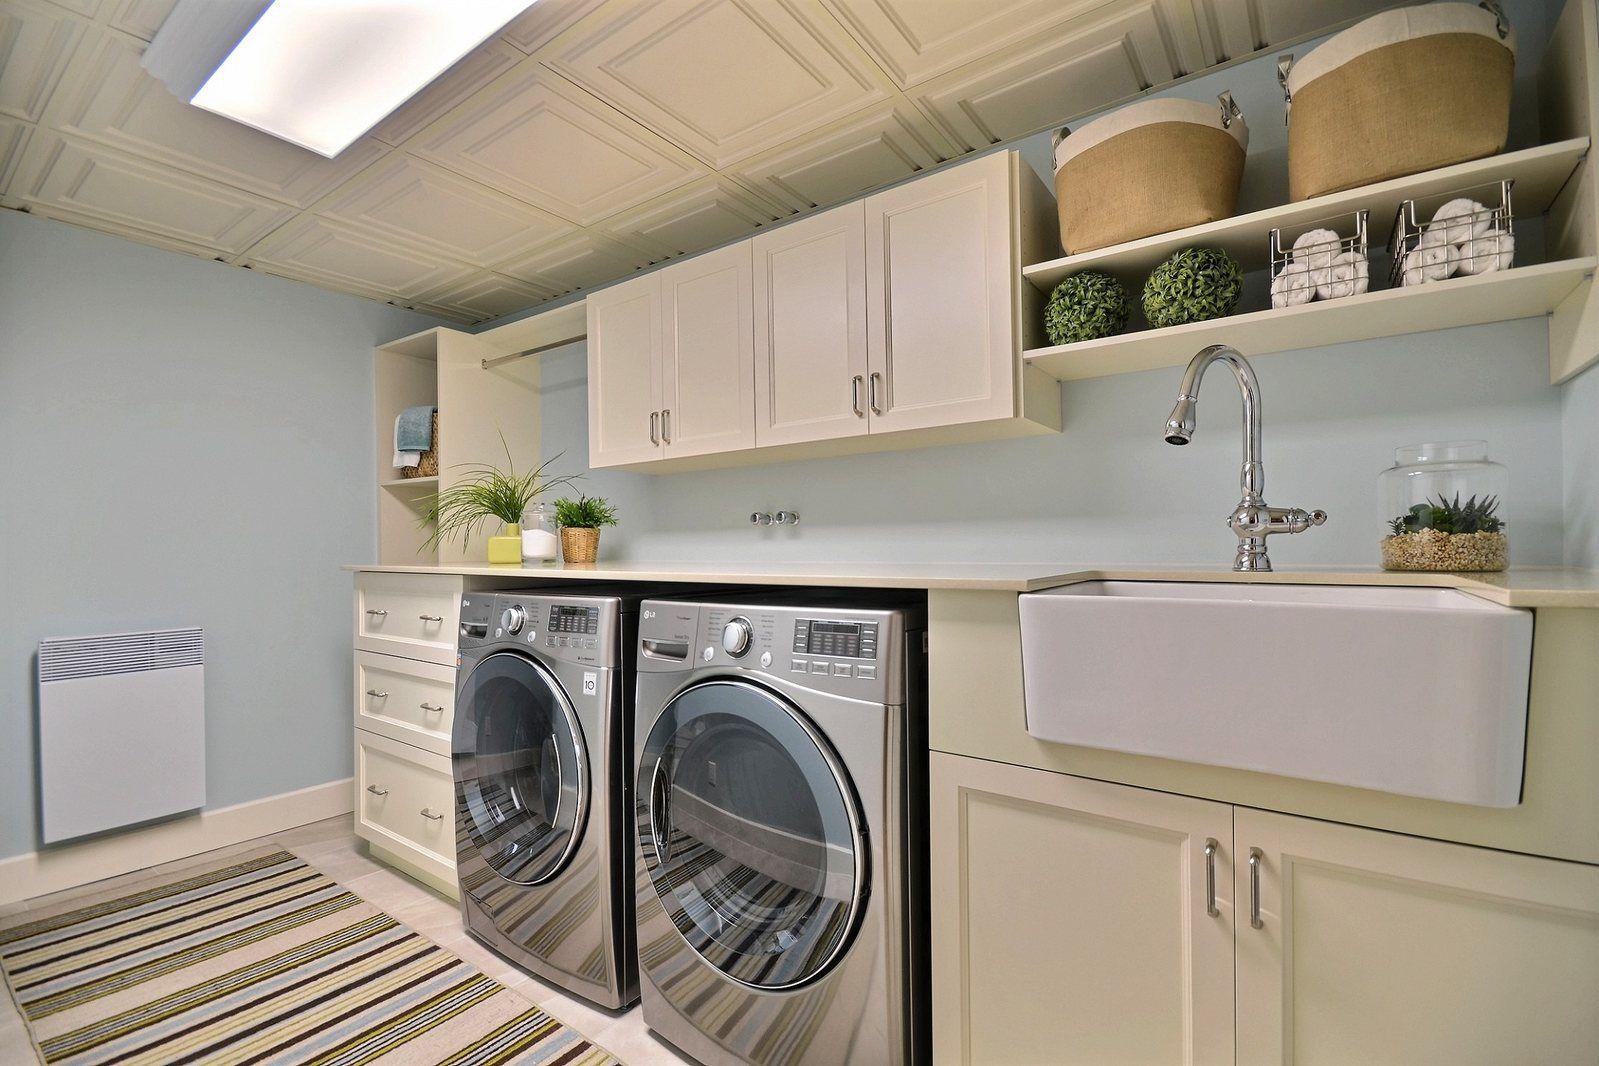 M lyssa robert designer salle de lavage de reve salle de lavage pinterest salle de bain for Salle de bain de reve